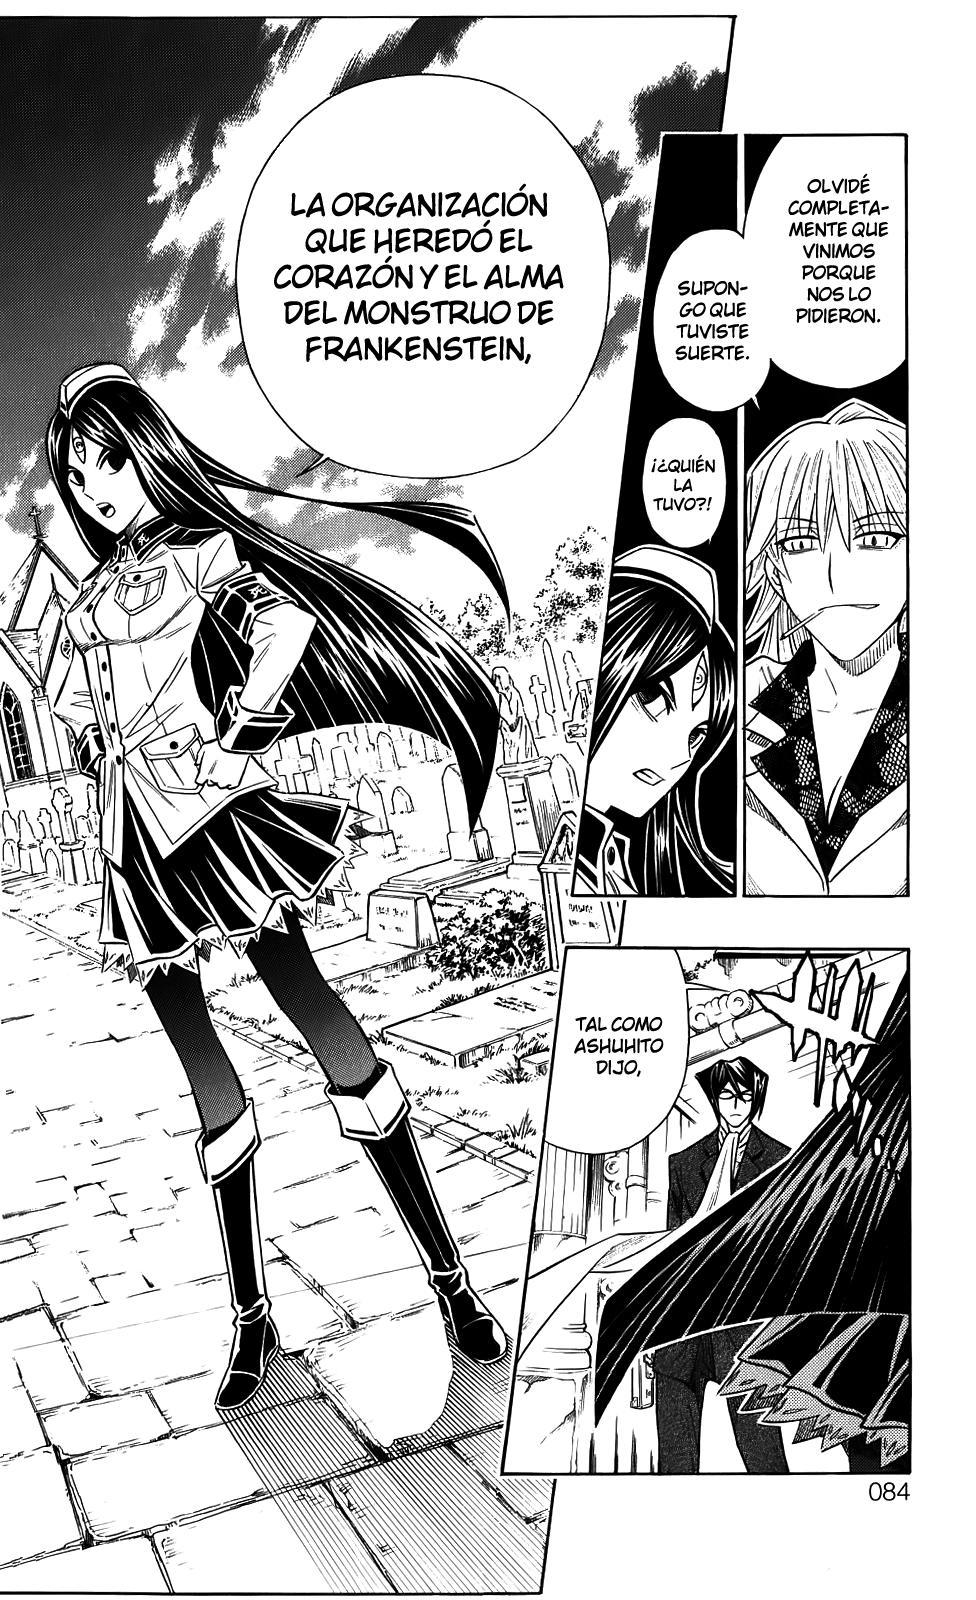 http://c5.ninemanga.com/es_manga/45/18797/447905/4c4e5249f45d8cf6a0387c58ac13f514.jpg Page 8